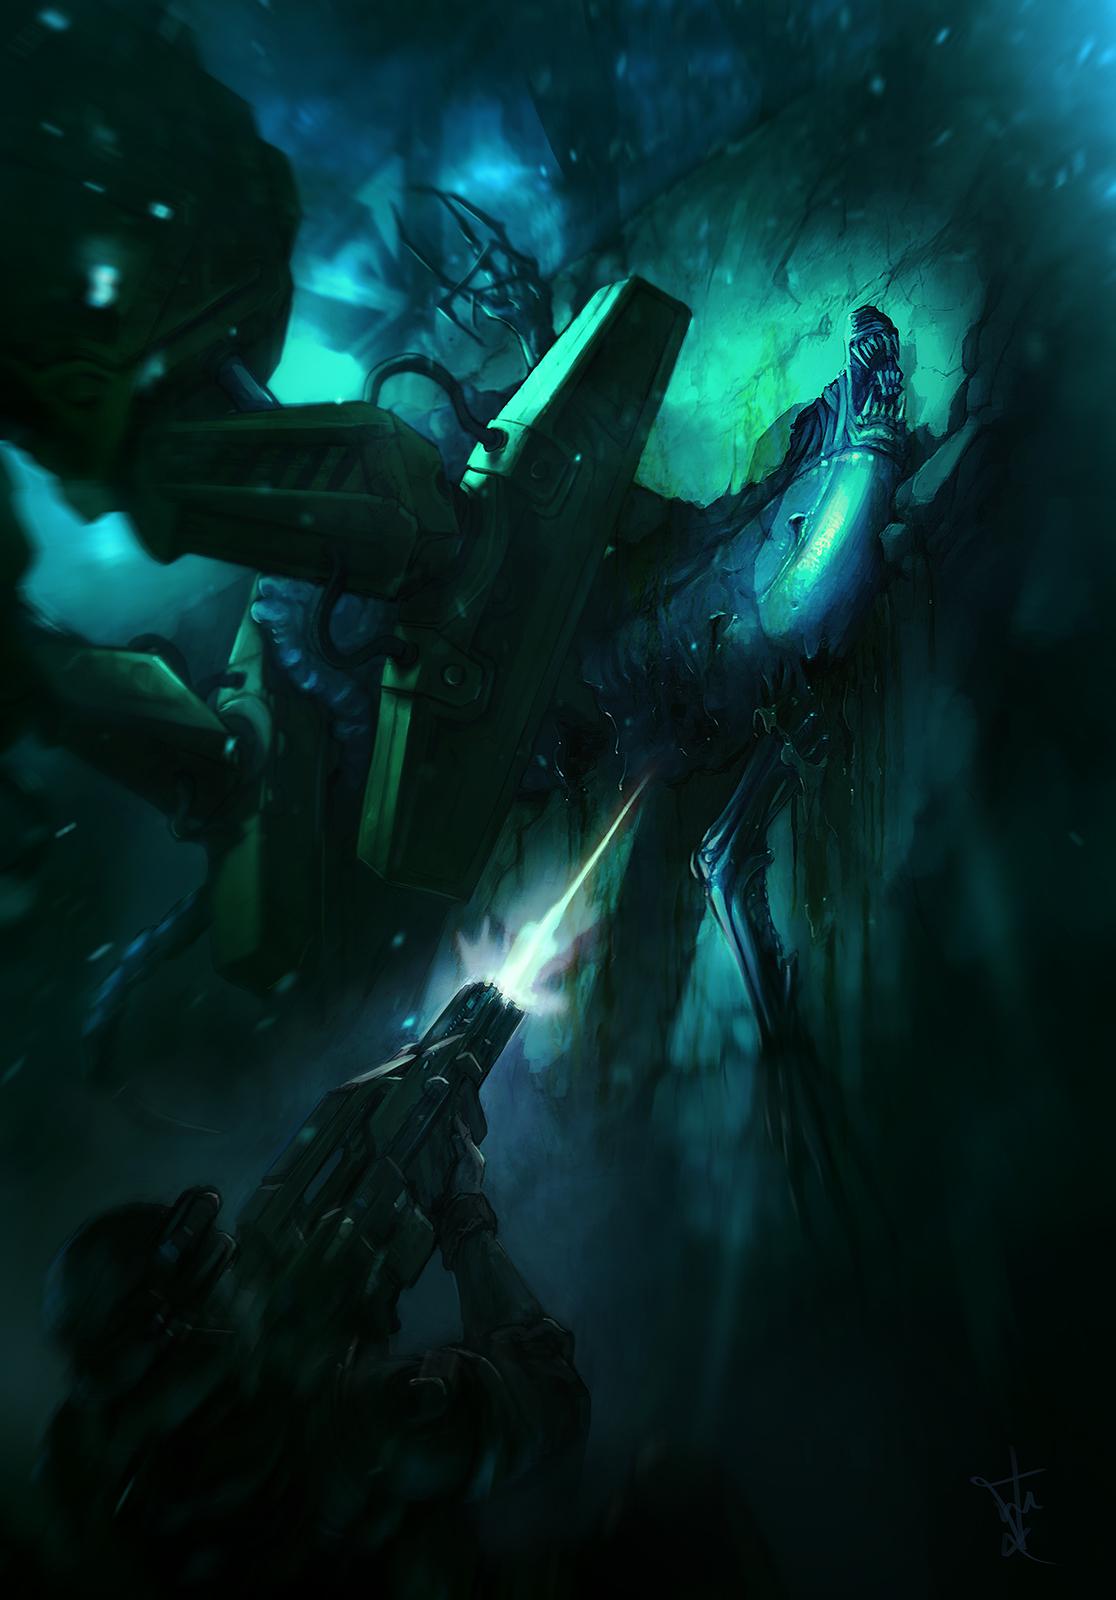 Aliens by cesarsampedro